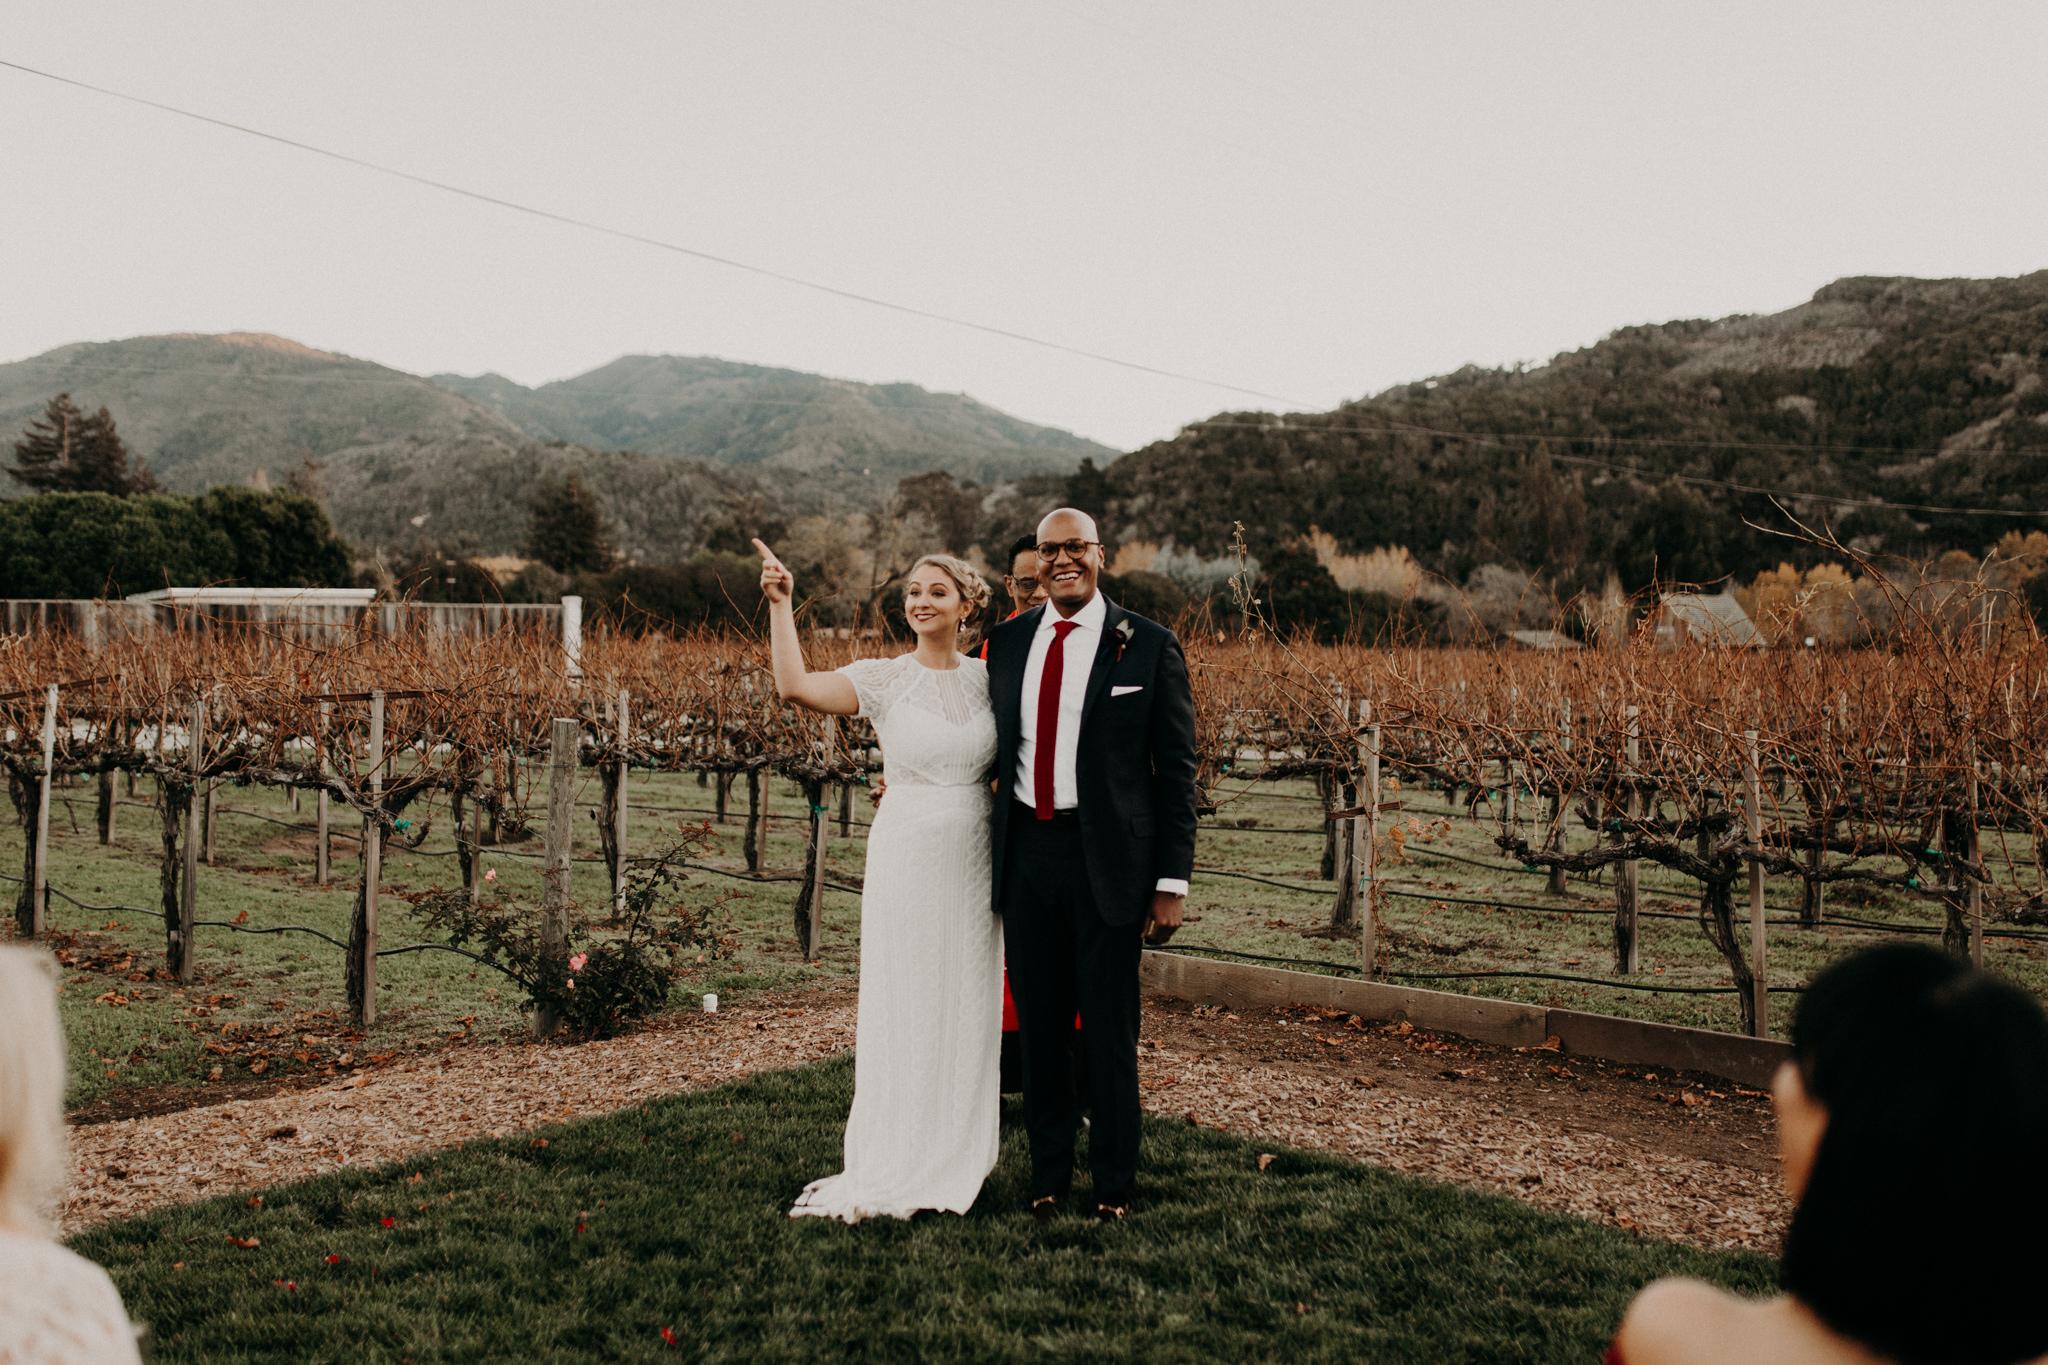 couple-wedding-carmel-wedding-97.jpg